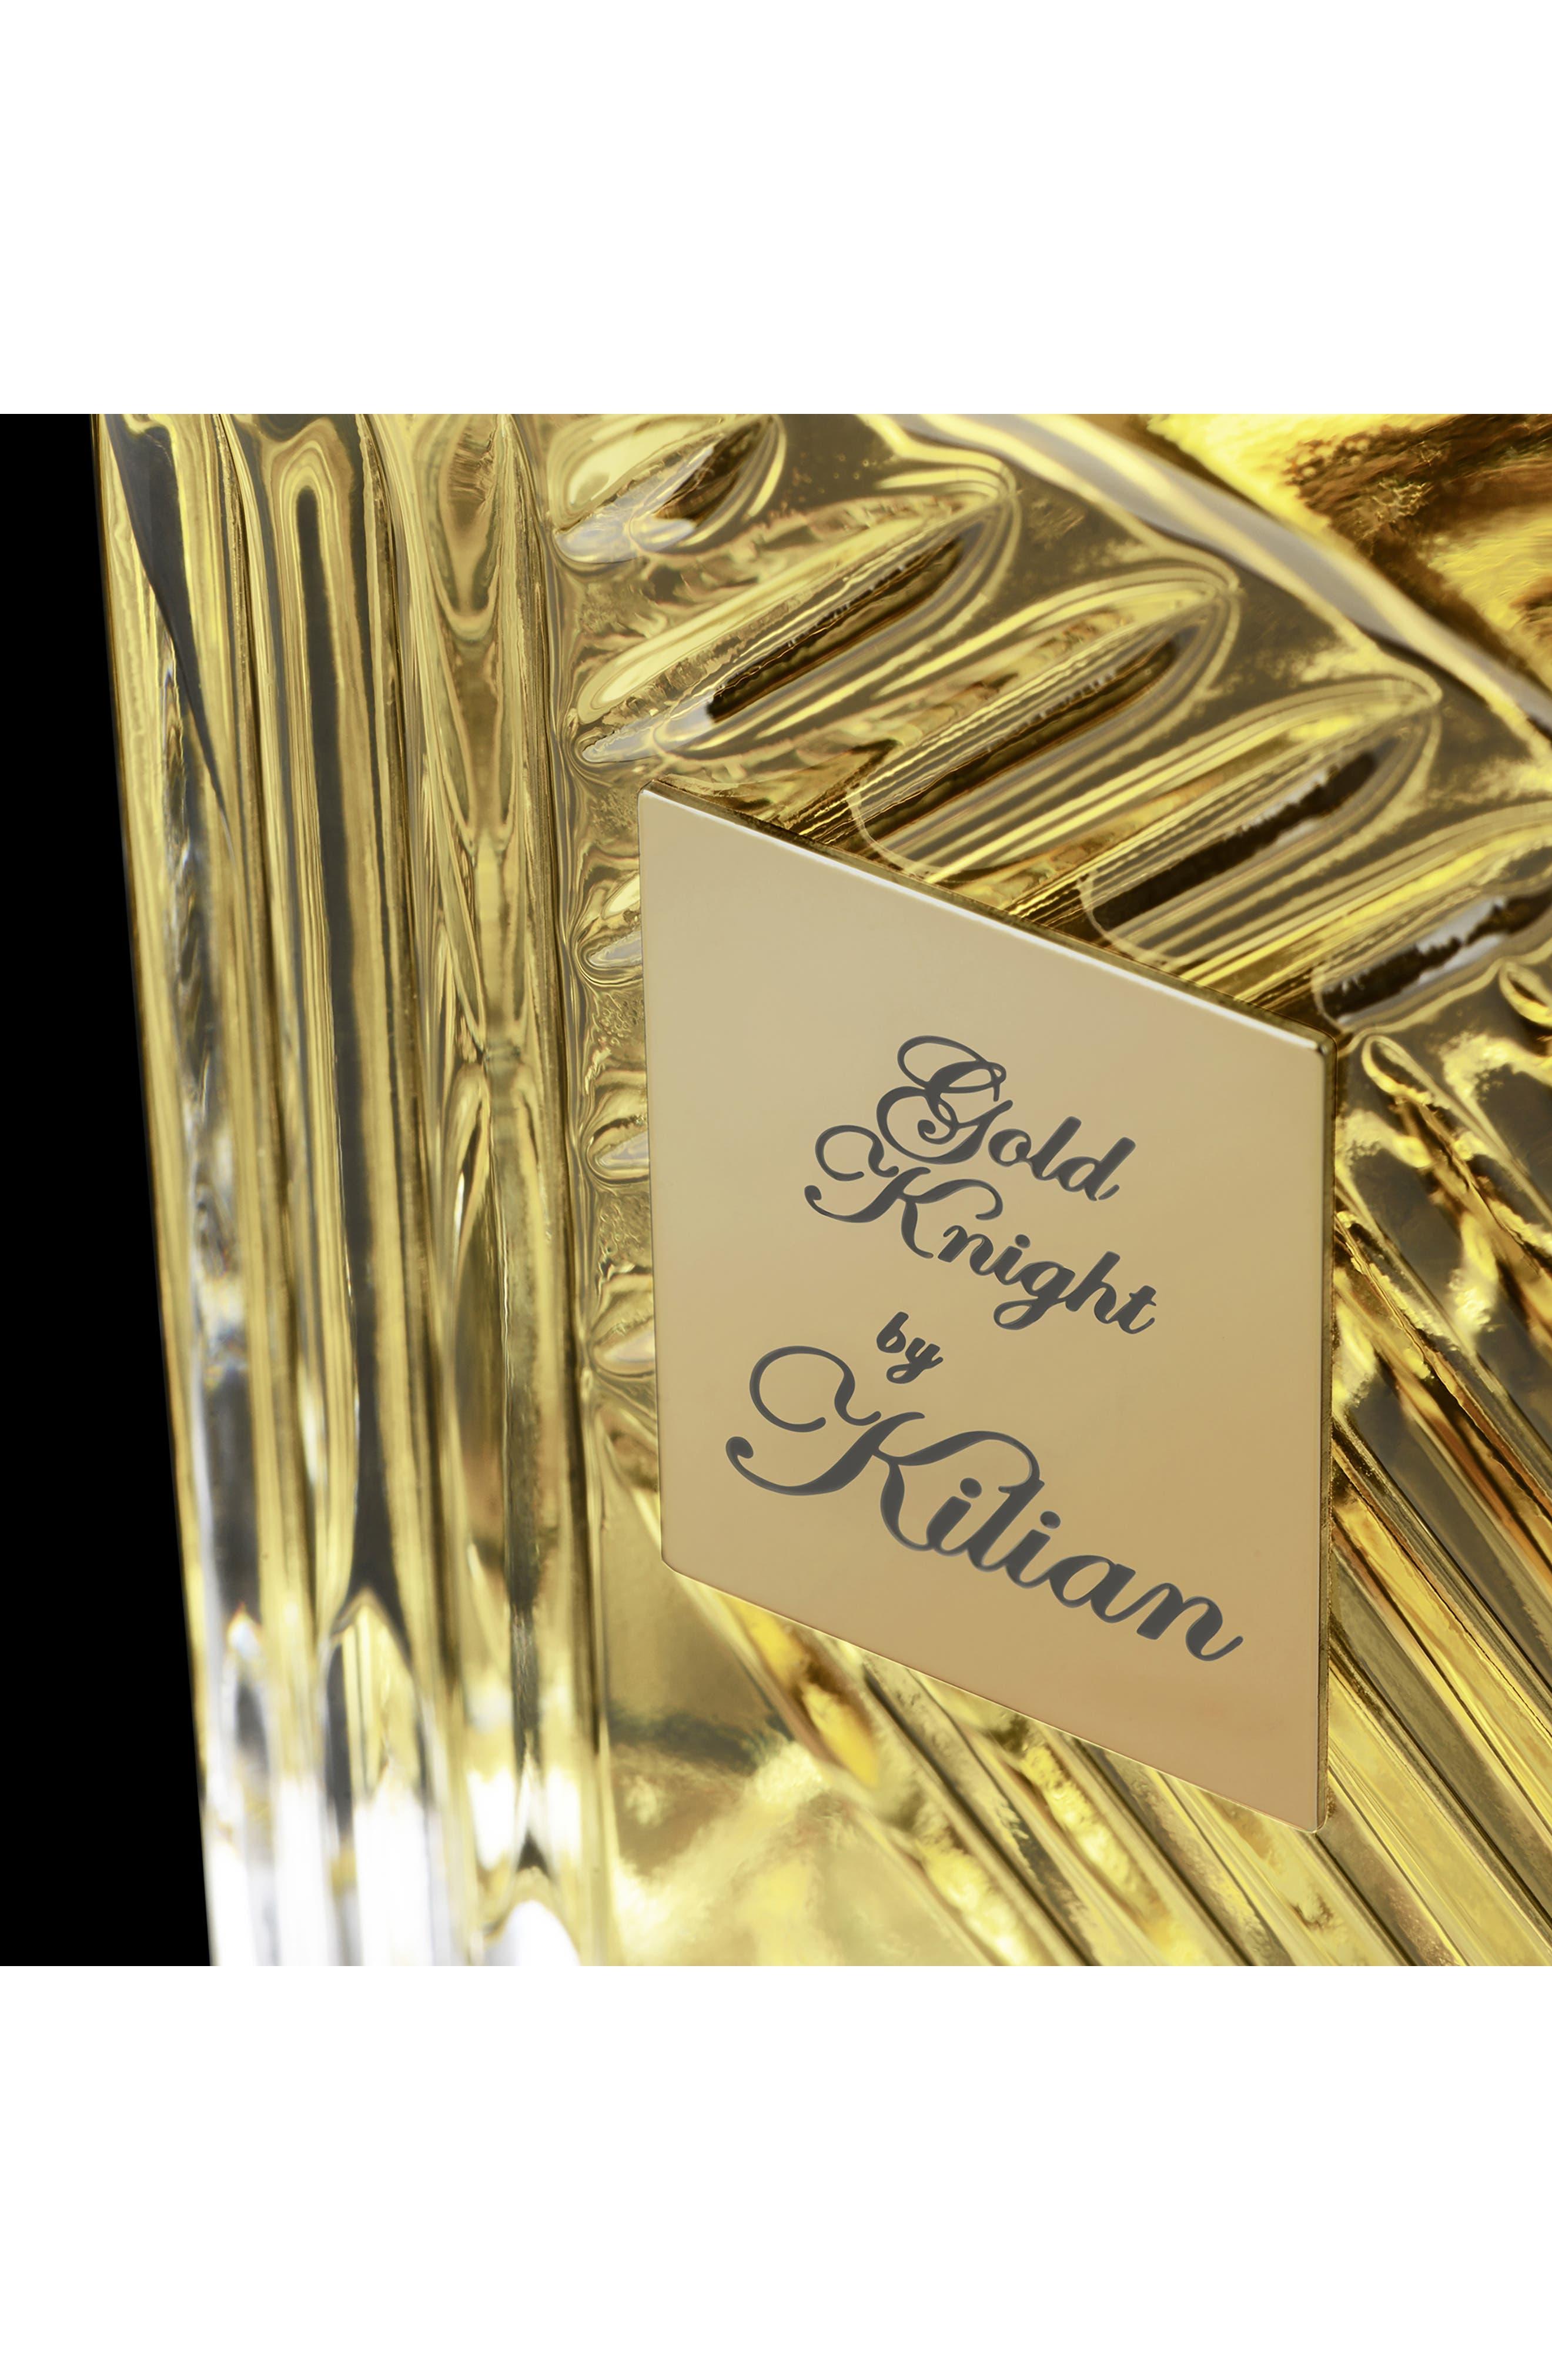 Gold Knight Mini Carafe Collector's Edition,                             Alternate thumbnail 2, color,                             NO COLOR